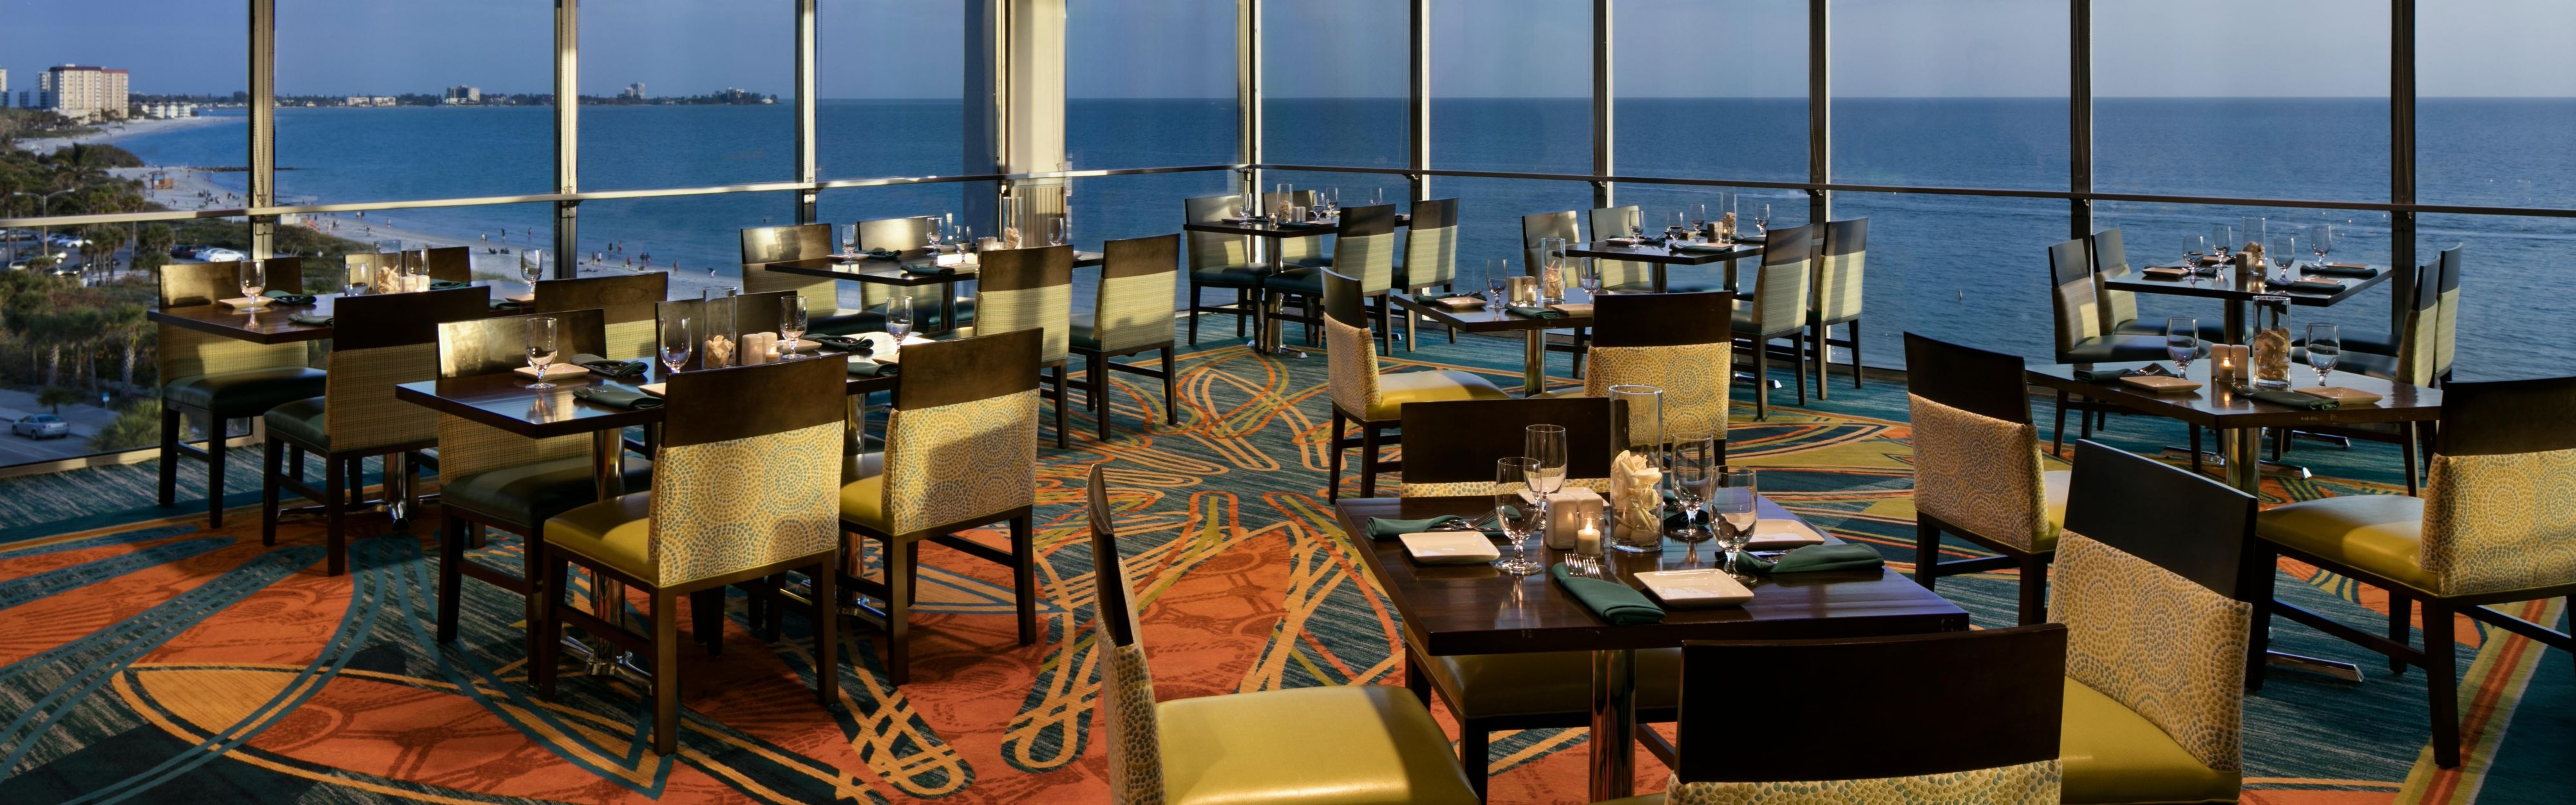 Holiday Inn Sarasota-Lido Beach-@The Beach image 3